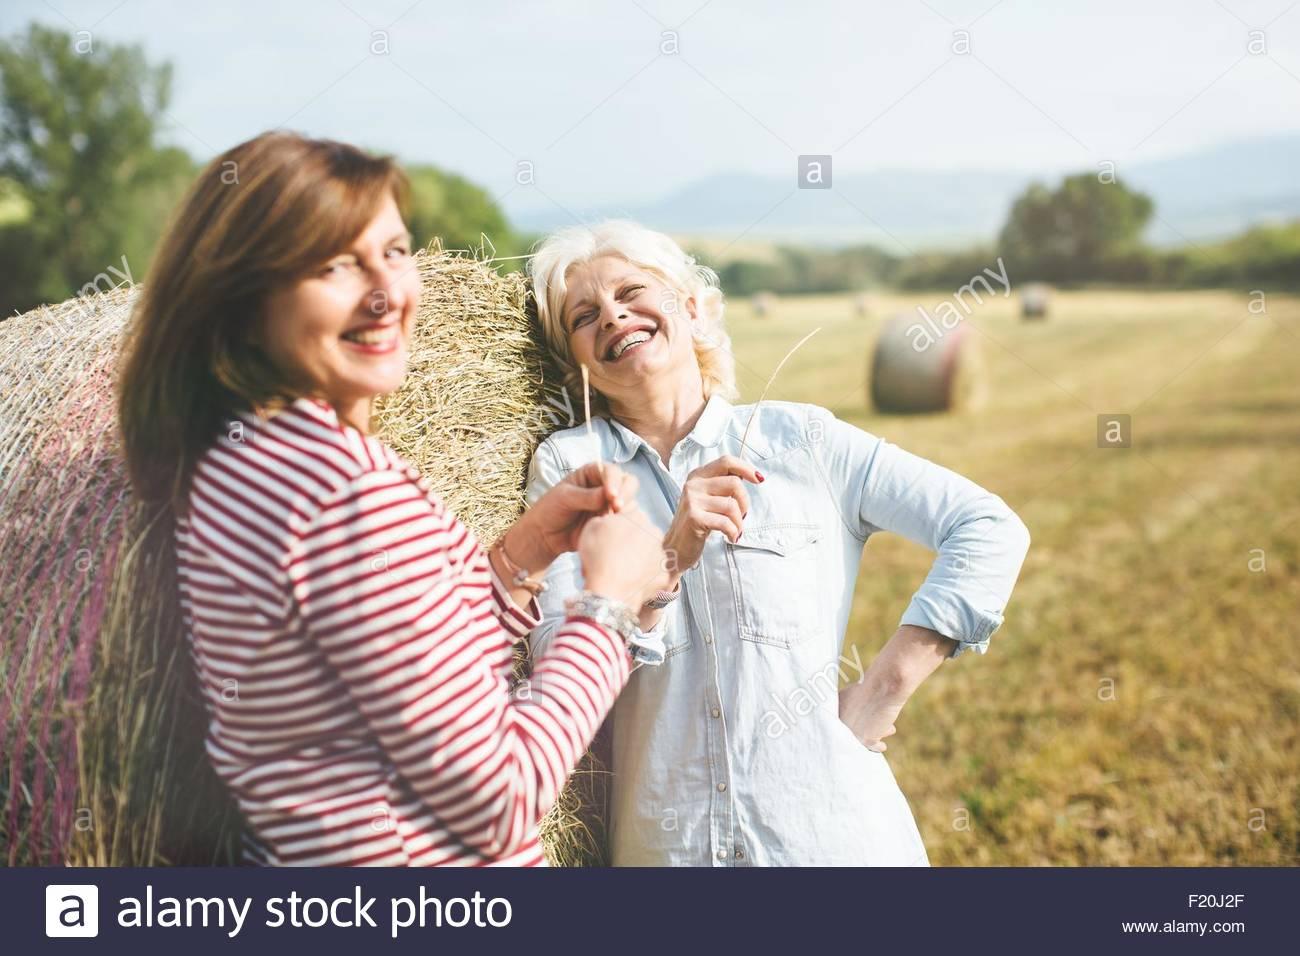 Zwei Reife Freundinnen mit Stroh Grass, Toskana, Italien Stockbild